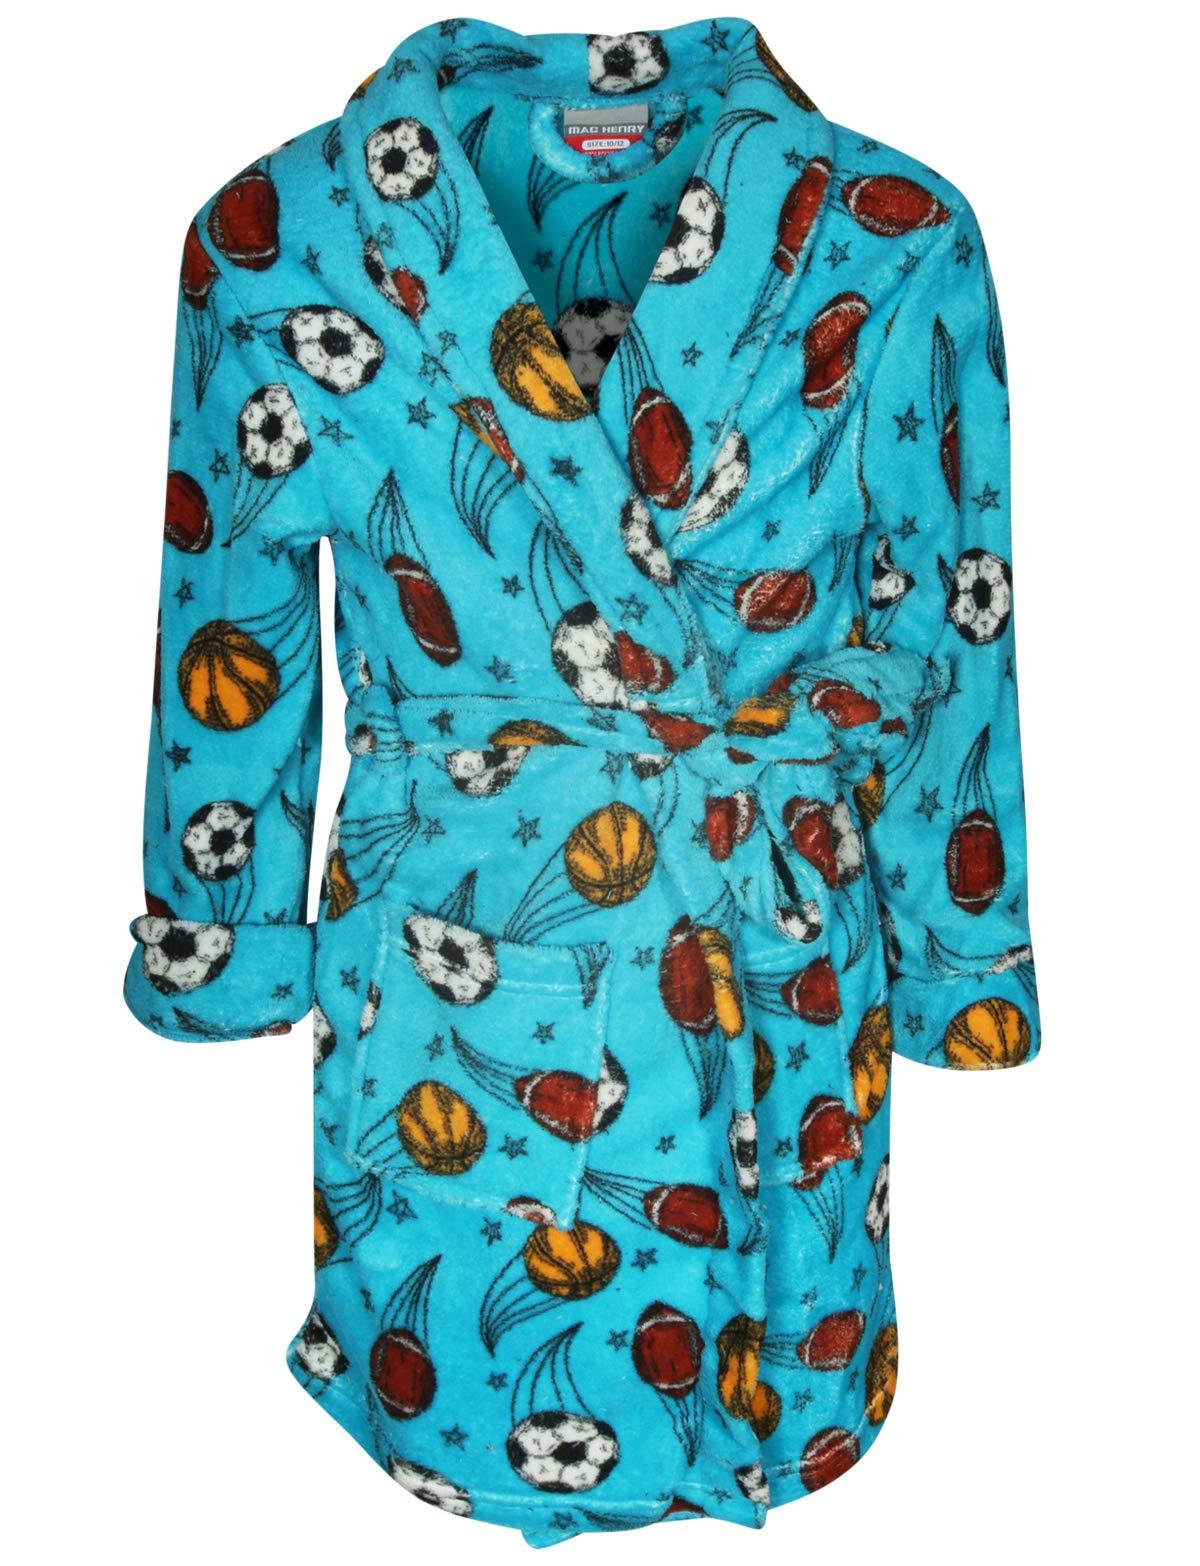 Image of Fleece Sports Bath Robe for Boys - Football, Basketball, Soccer